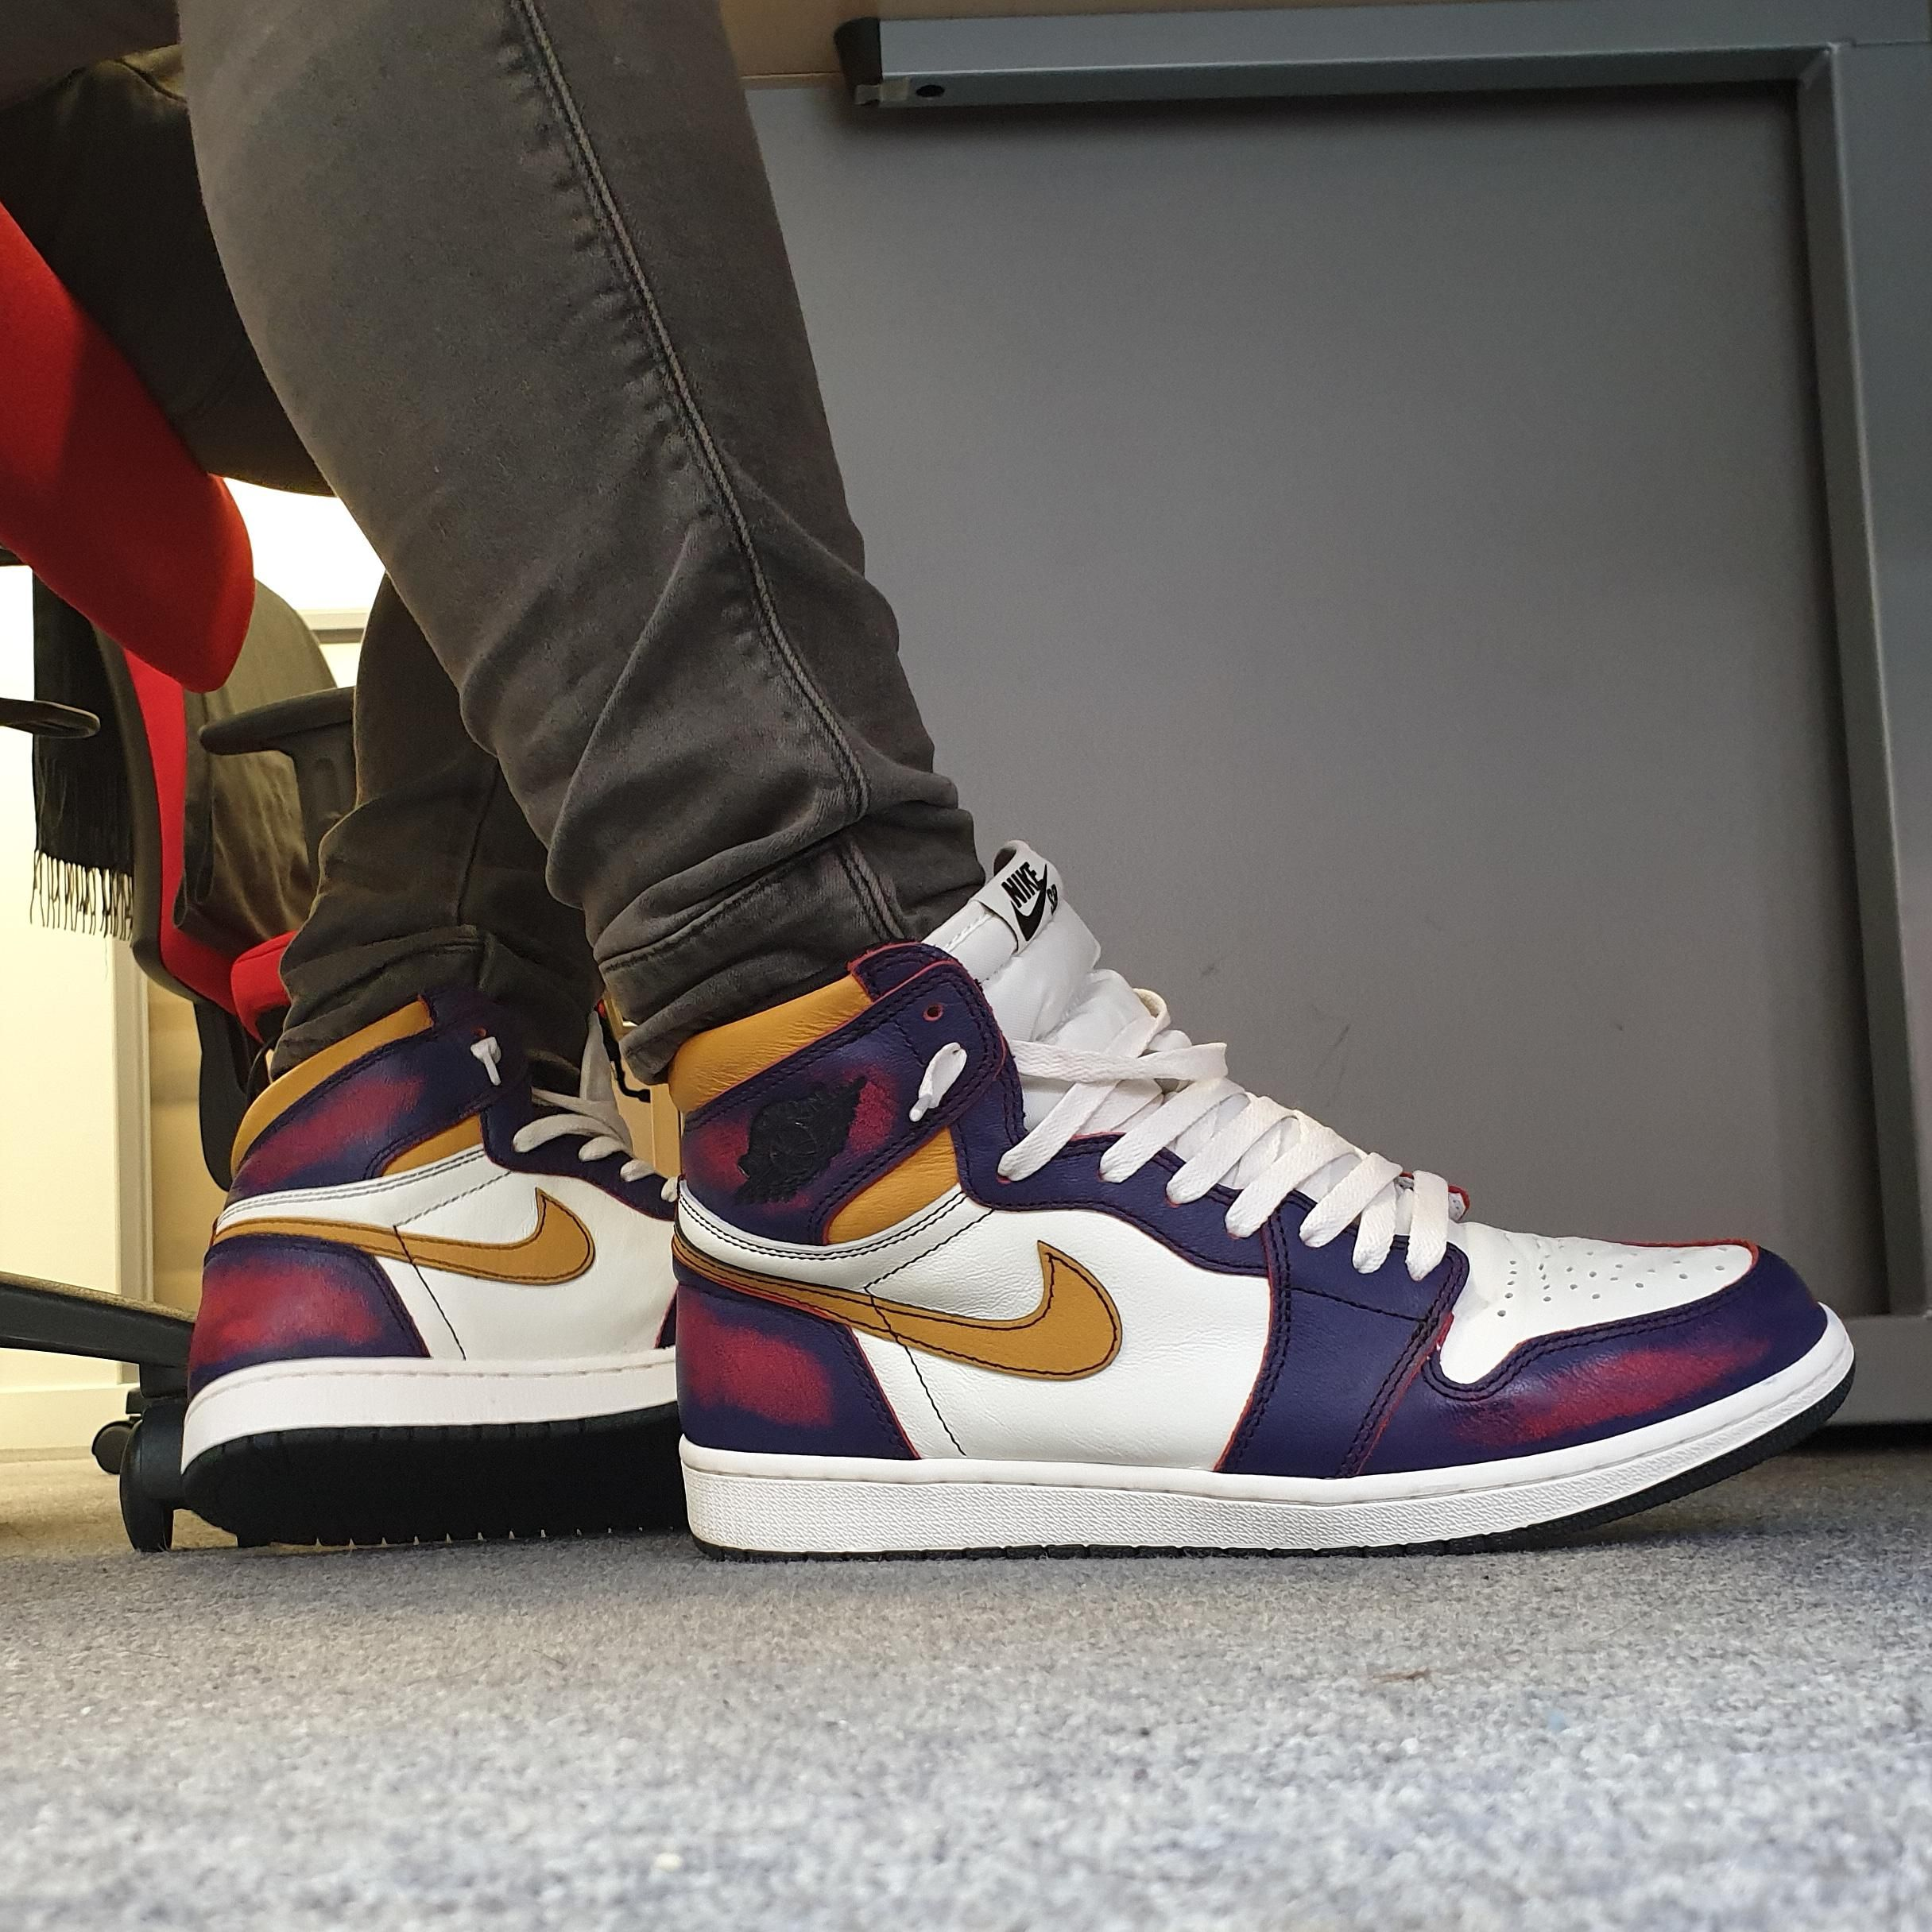 LA to Chicago Sneakers Sneakers, Nike shoes, Sneaker head